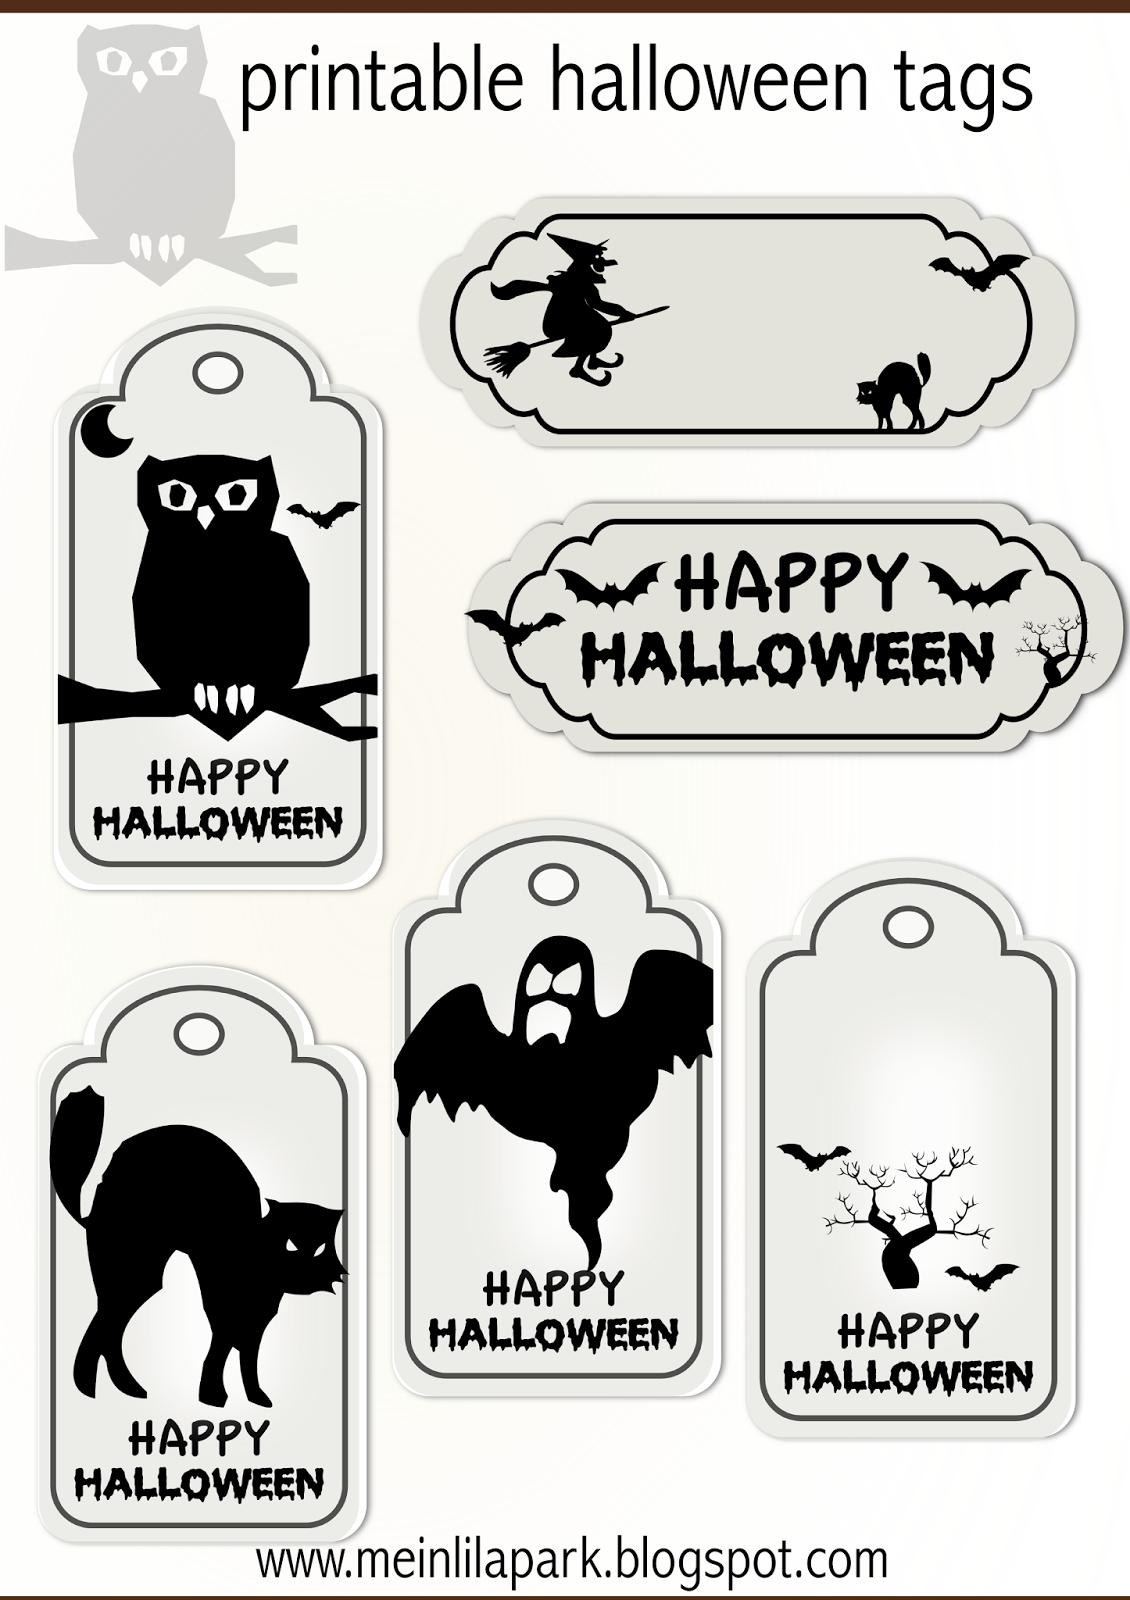 Free Printable Halloween Tags - Druckvorlage Halloween - Freebie - Free Printable Halloween Labels